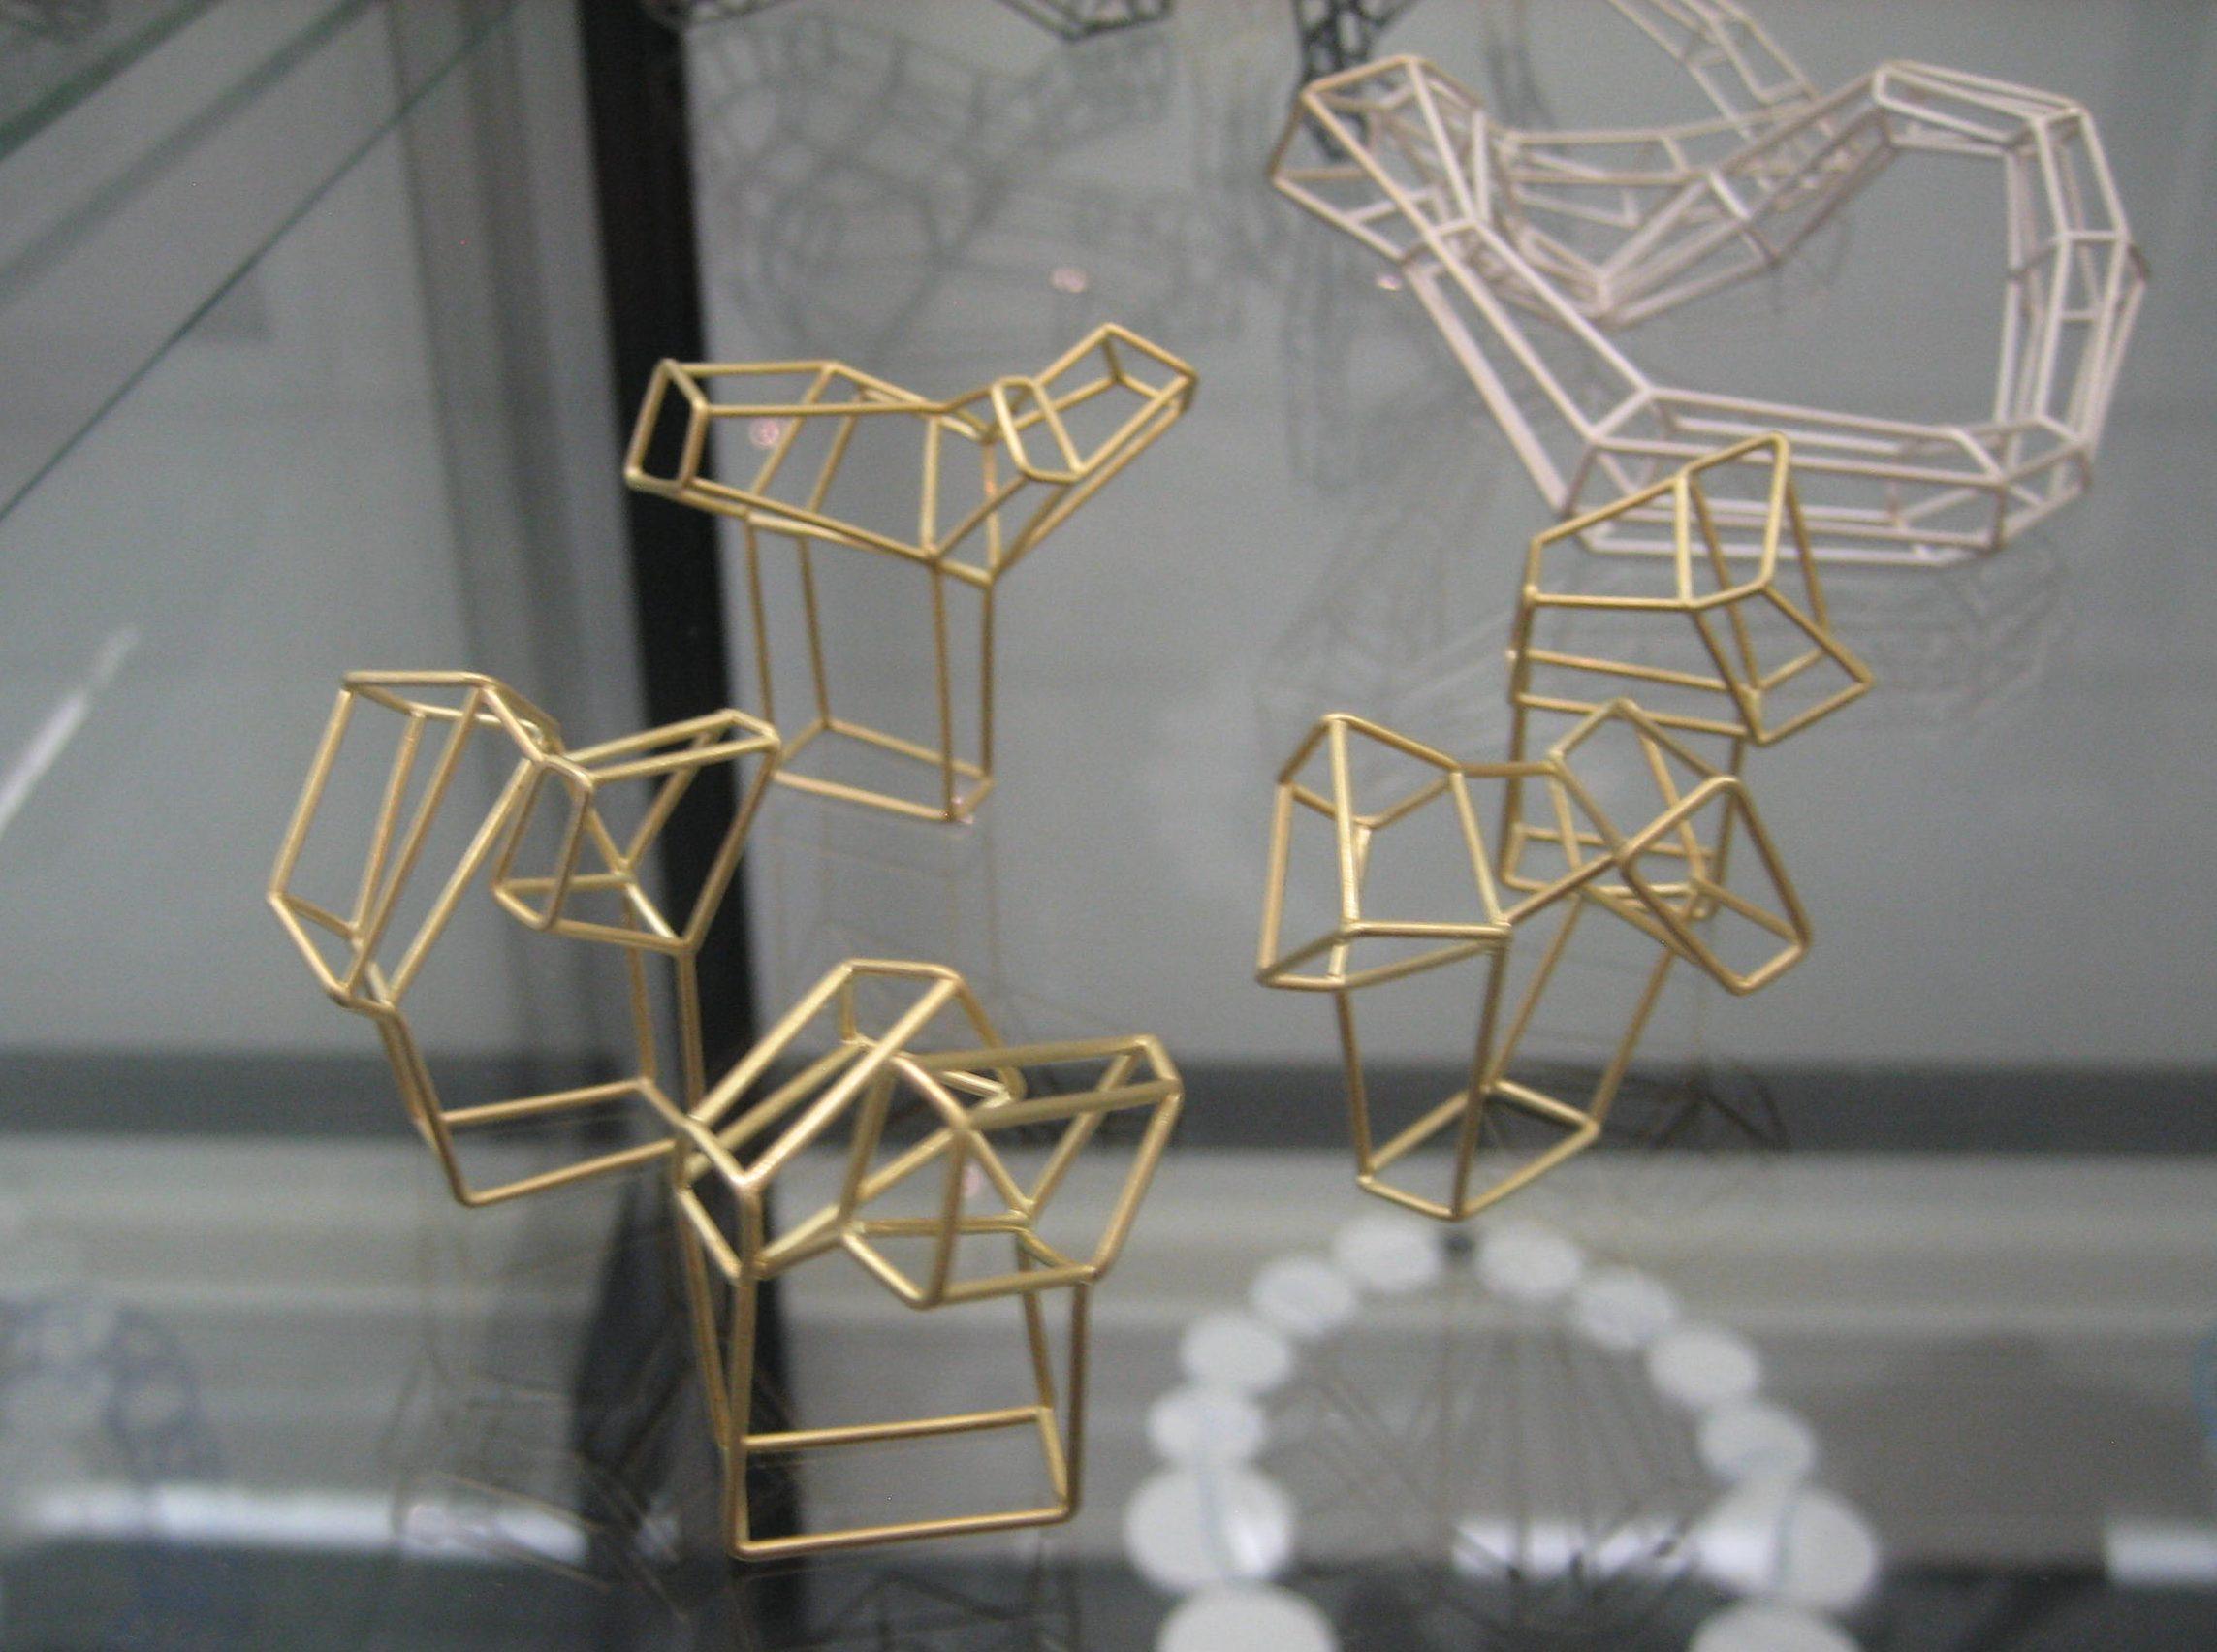 Carlier Makigawa, ringen in Galerie Ra, juni 2018, goud, vitrine